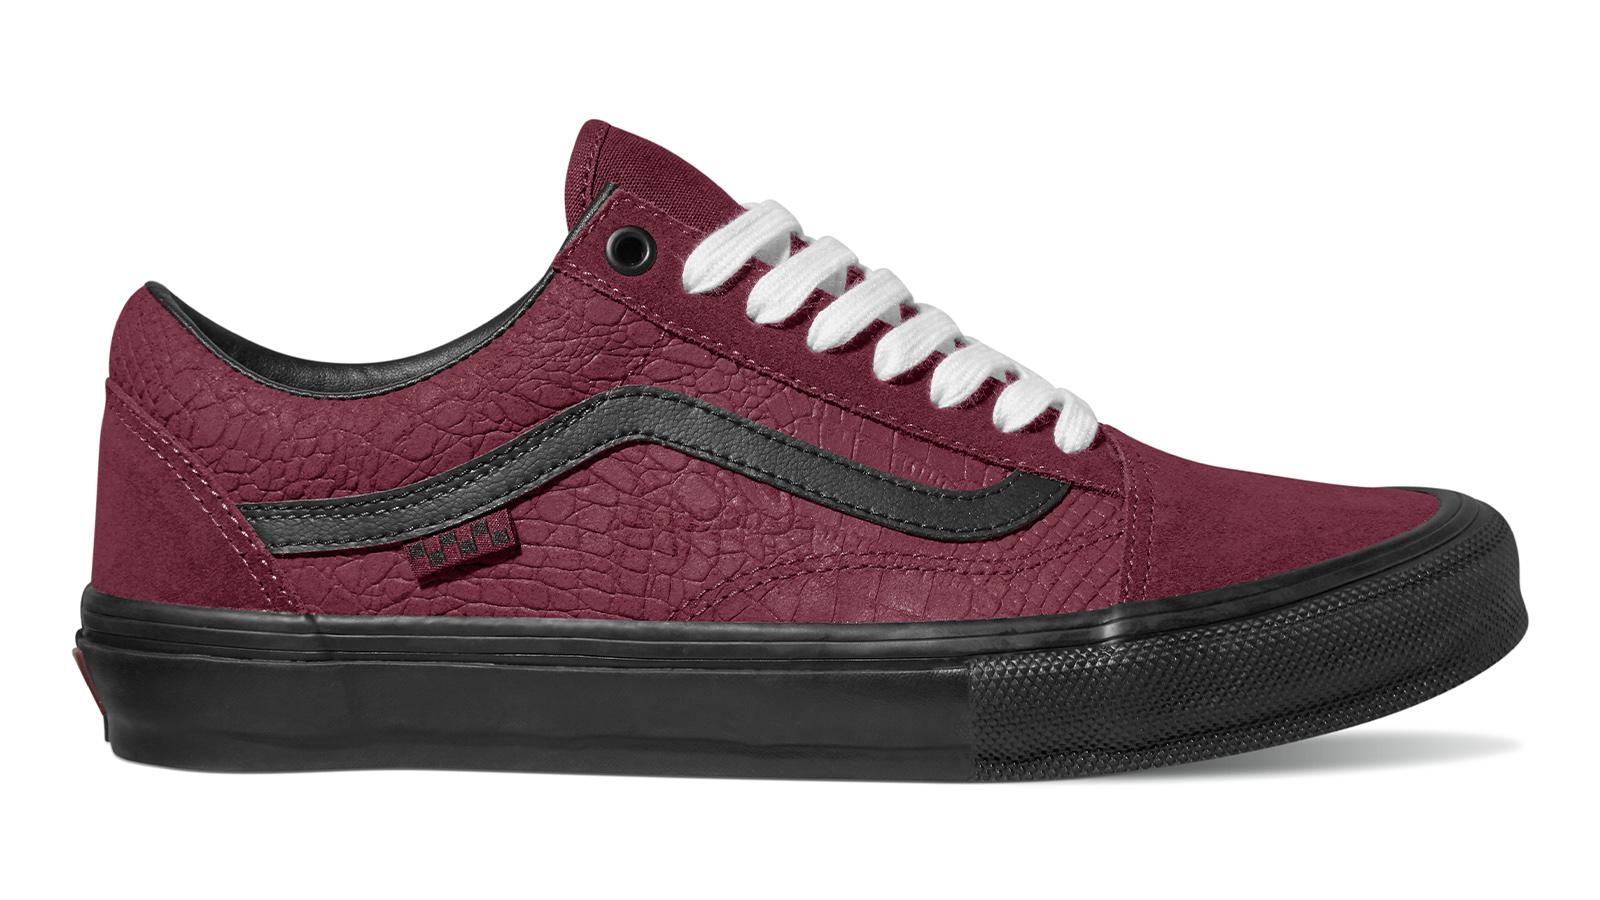 Vans SS21 Skate Shoes